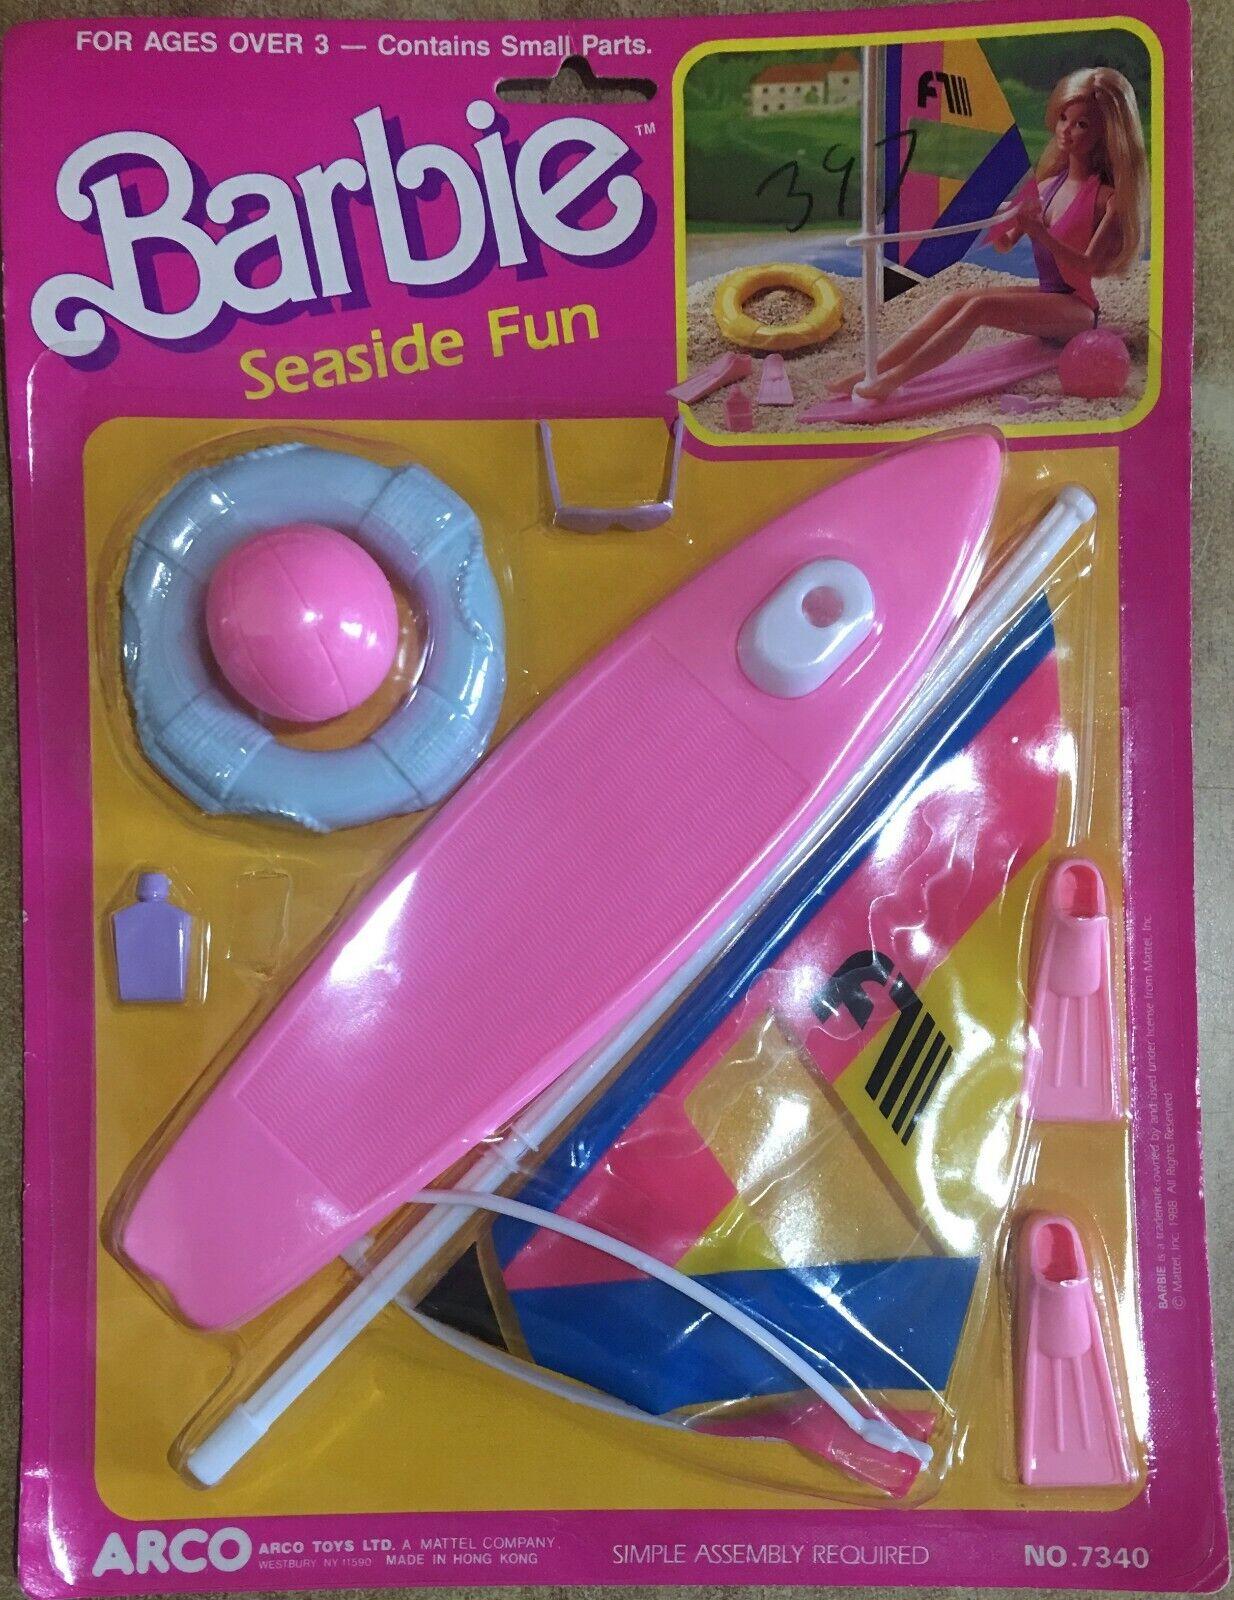 Barbie Seaside Windsurf Set Arco by Mattel Vintage 88' 88' 88' RARO 1d5486